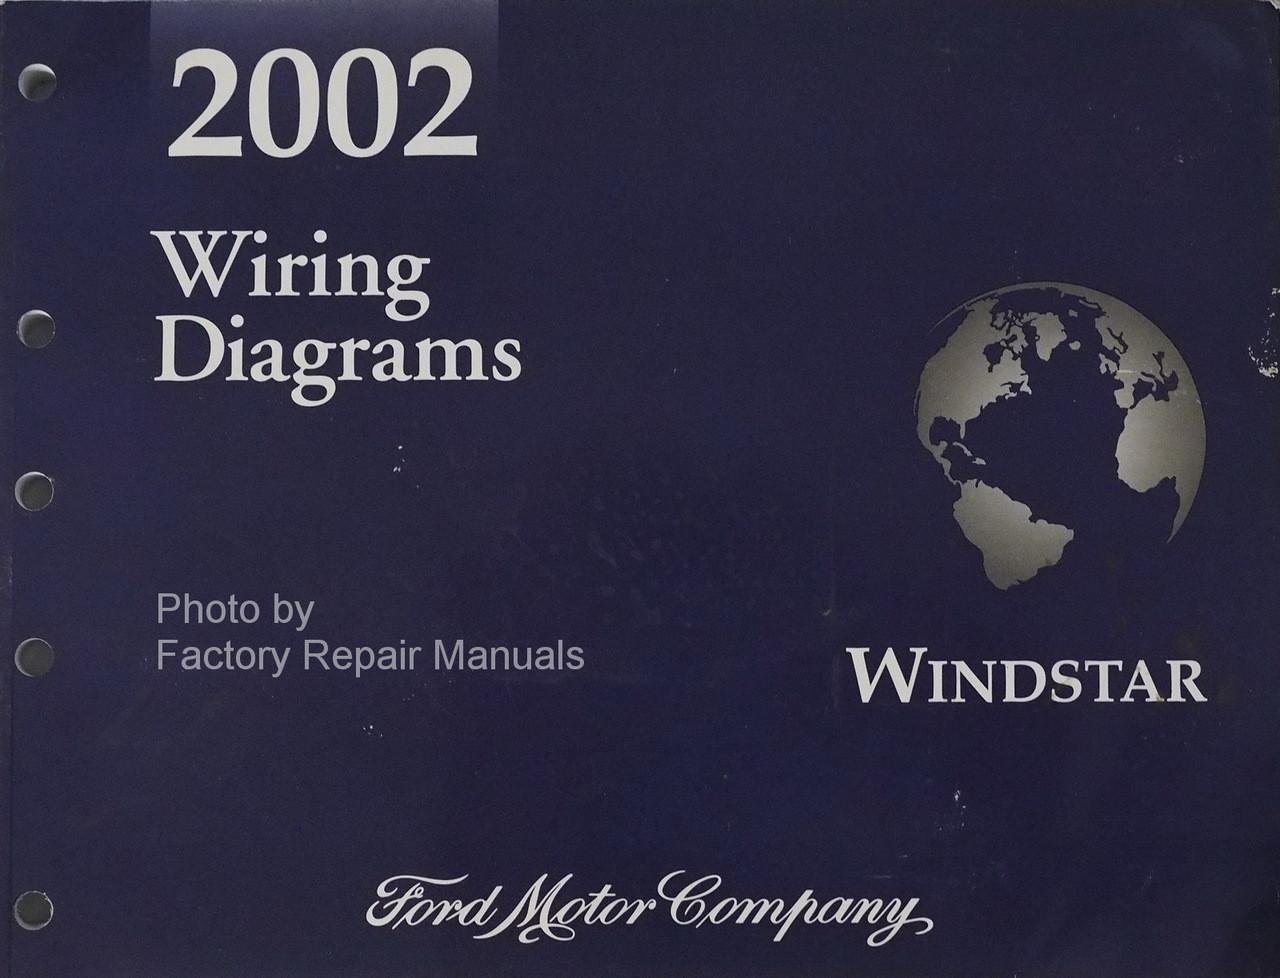 [SCHEMATICS_44OR]  2002 Ford Windstar Electrical Wiring Diagrams Original Manual - Factory  Repair Manuals | Wiring Diagram For Ford Windstar |  | Factory Repair Manuals